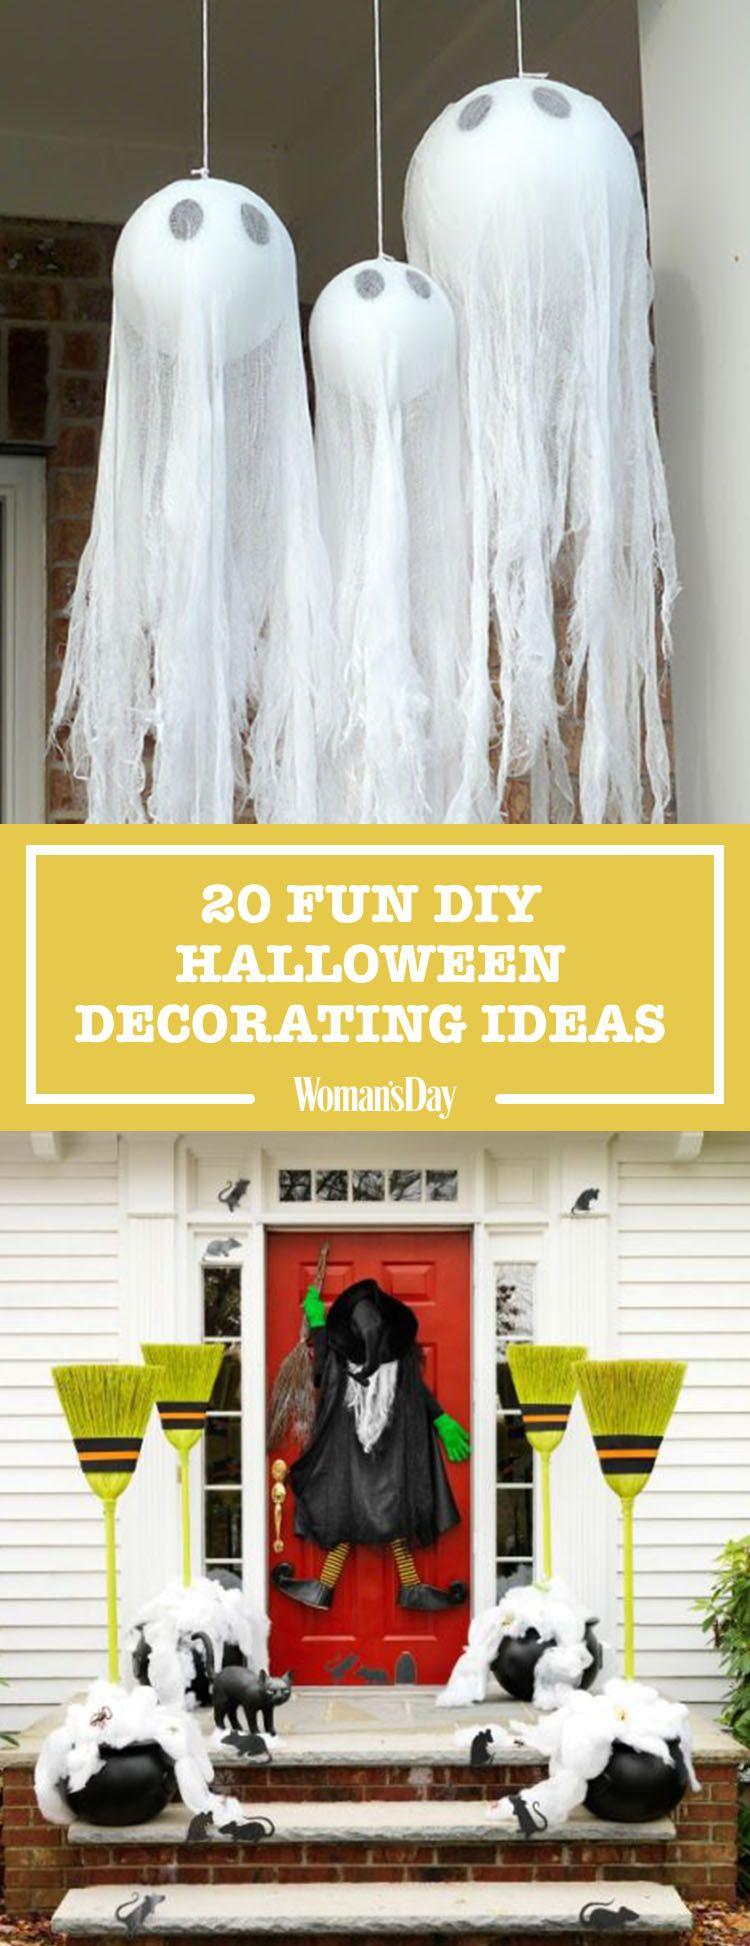 40+ Easy DIY Halloween Decoration Ideas - Homemade Halloween Decor ...